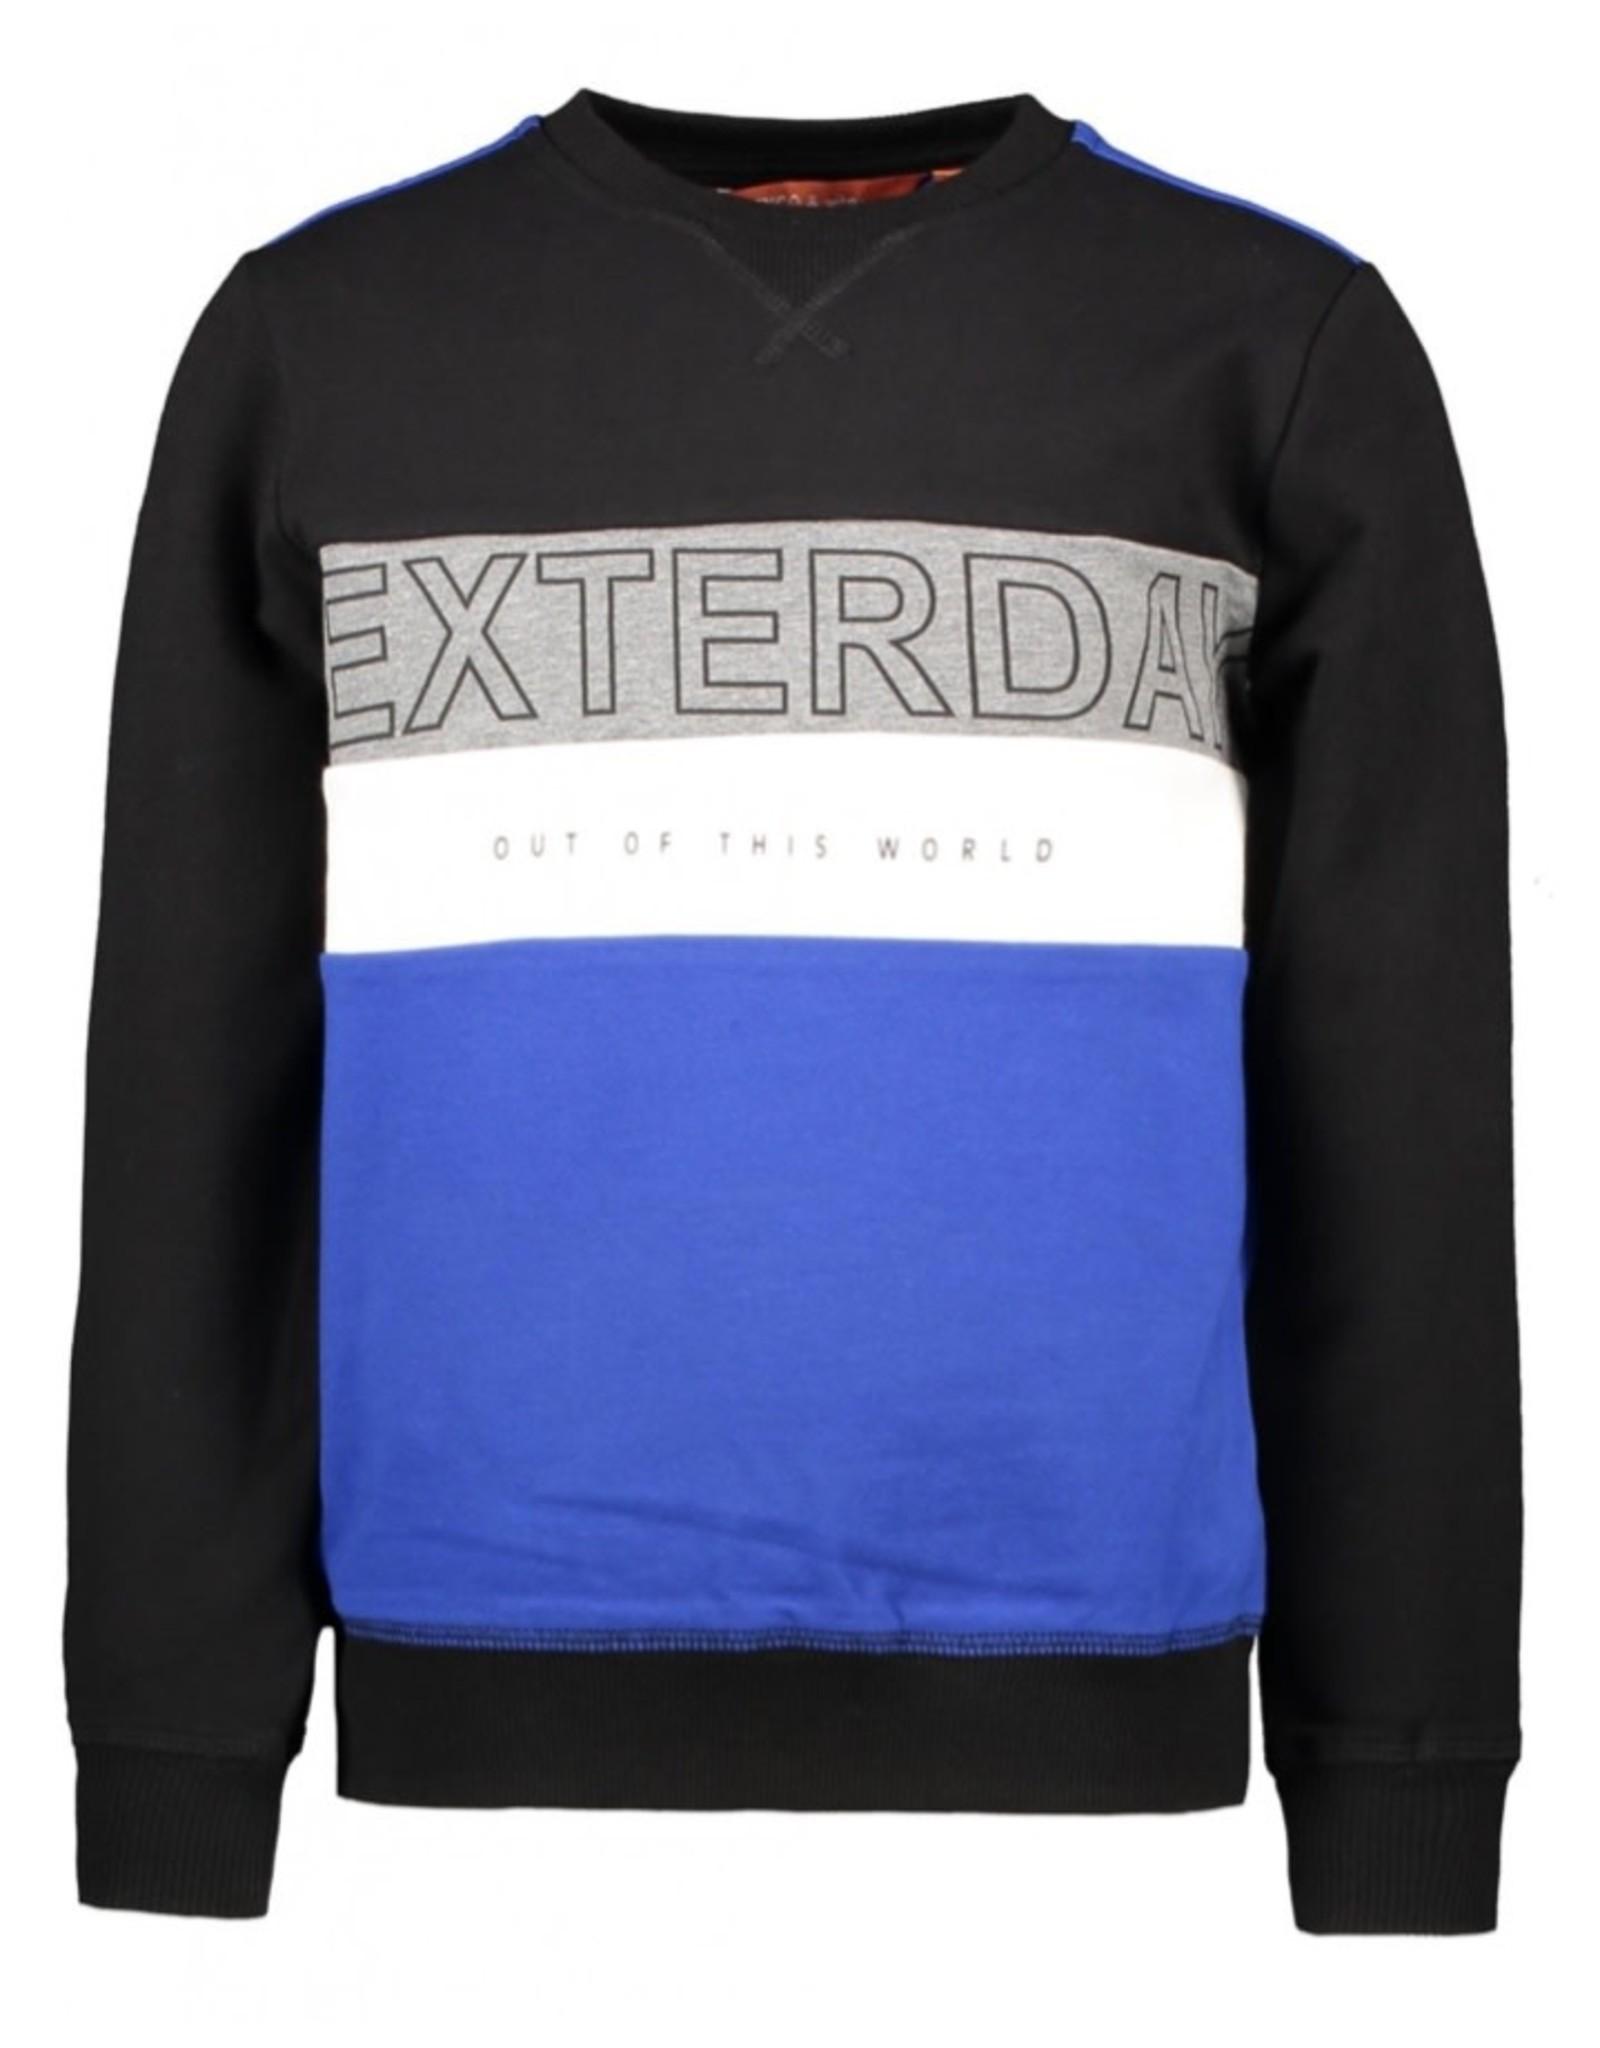 Tygo & vito X009-6342  Sweater